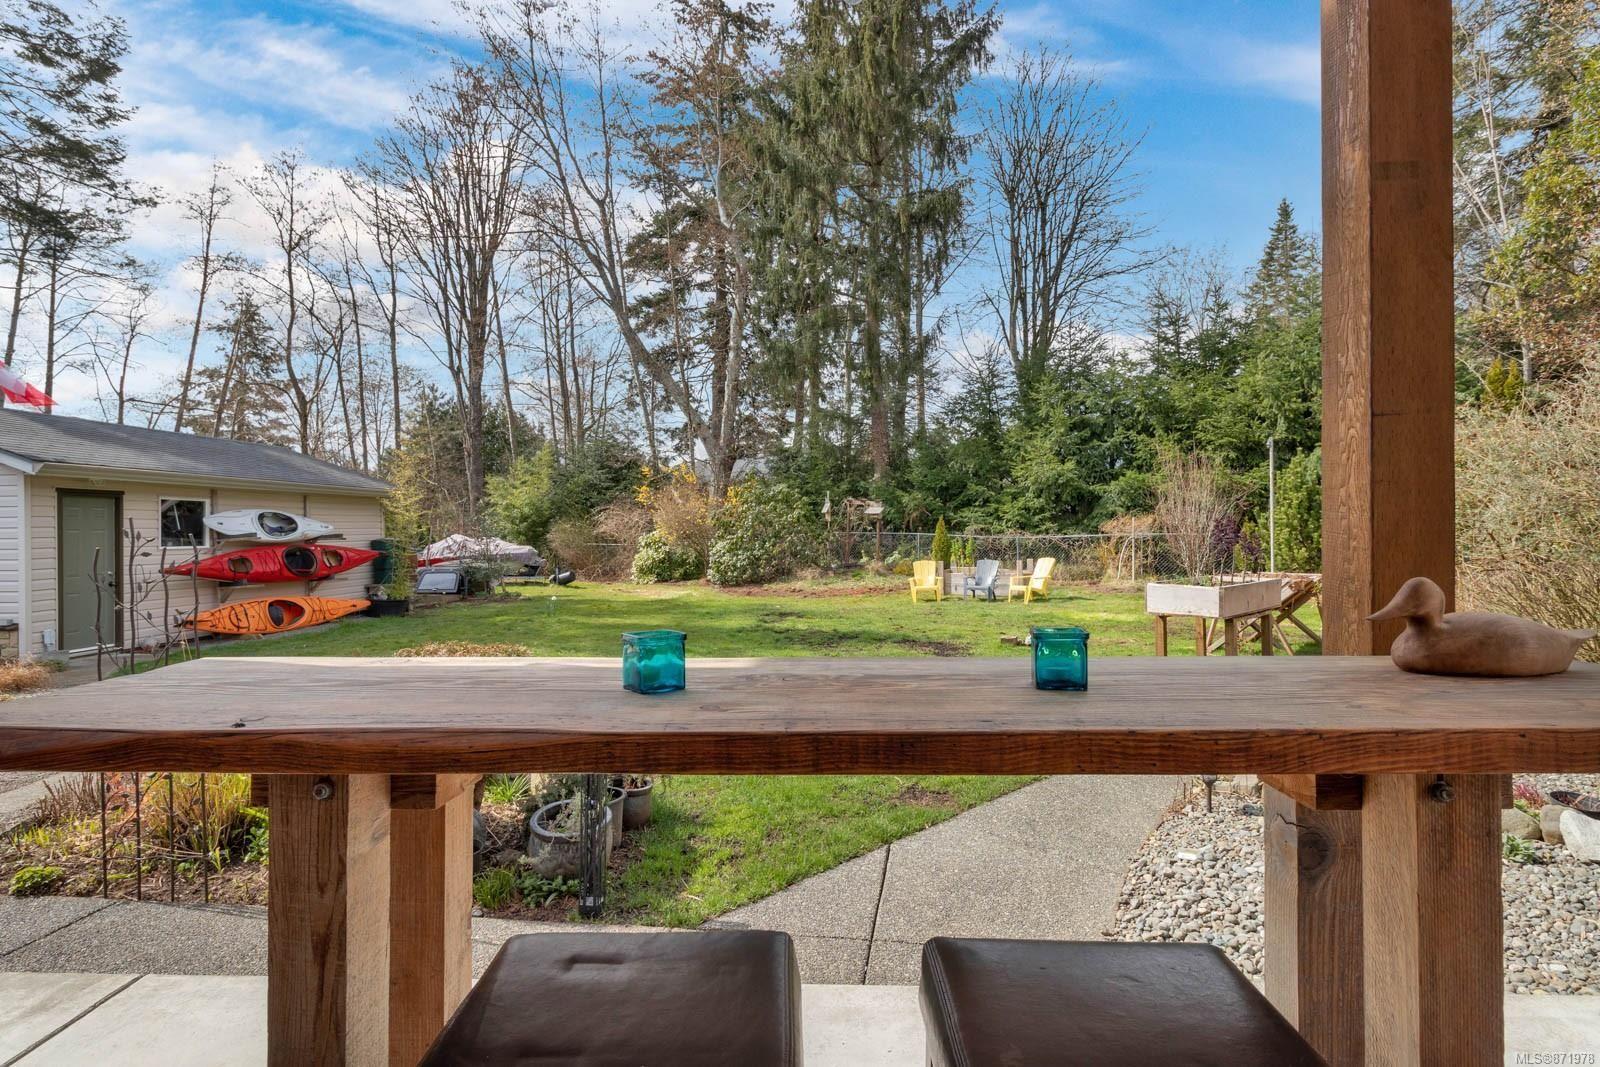 Photo 24: Photos: 1539 Chilcotin Cres in : CV Comox (Town of) House for sale (Comox Valley)  : MLS®# 871978